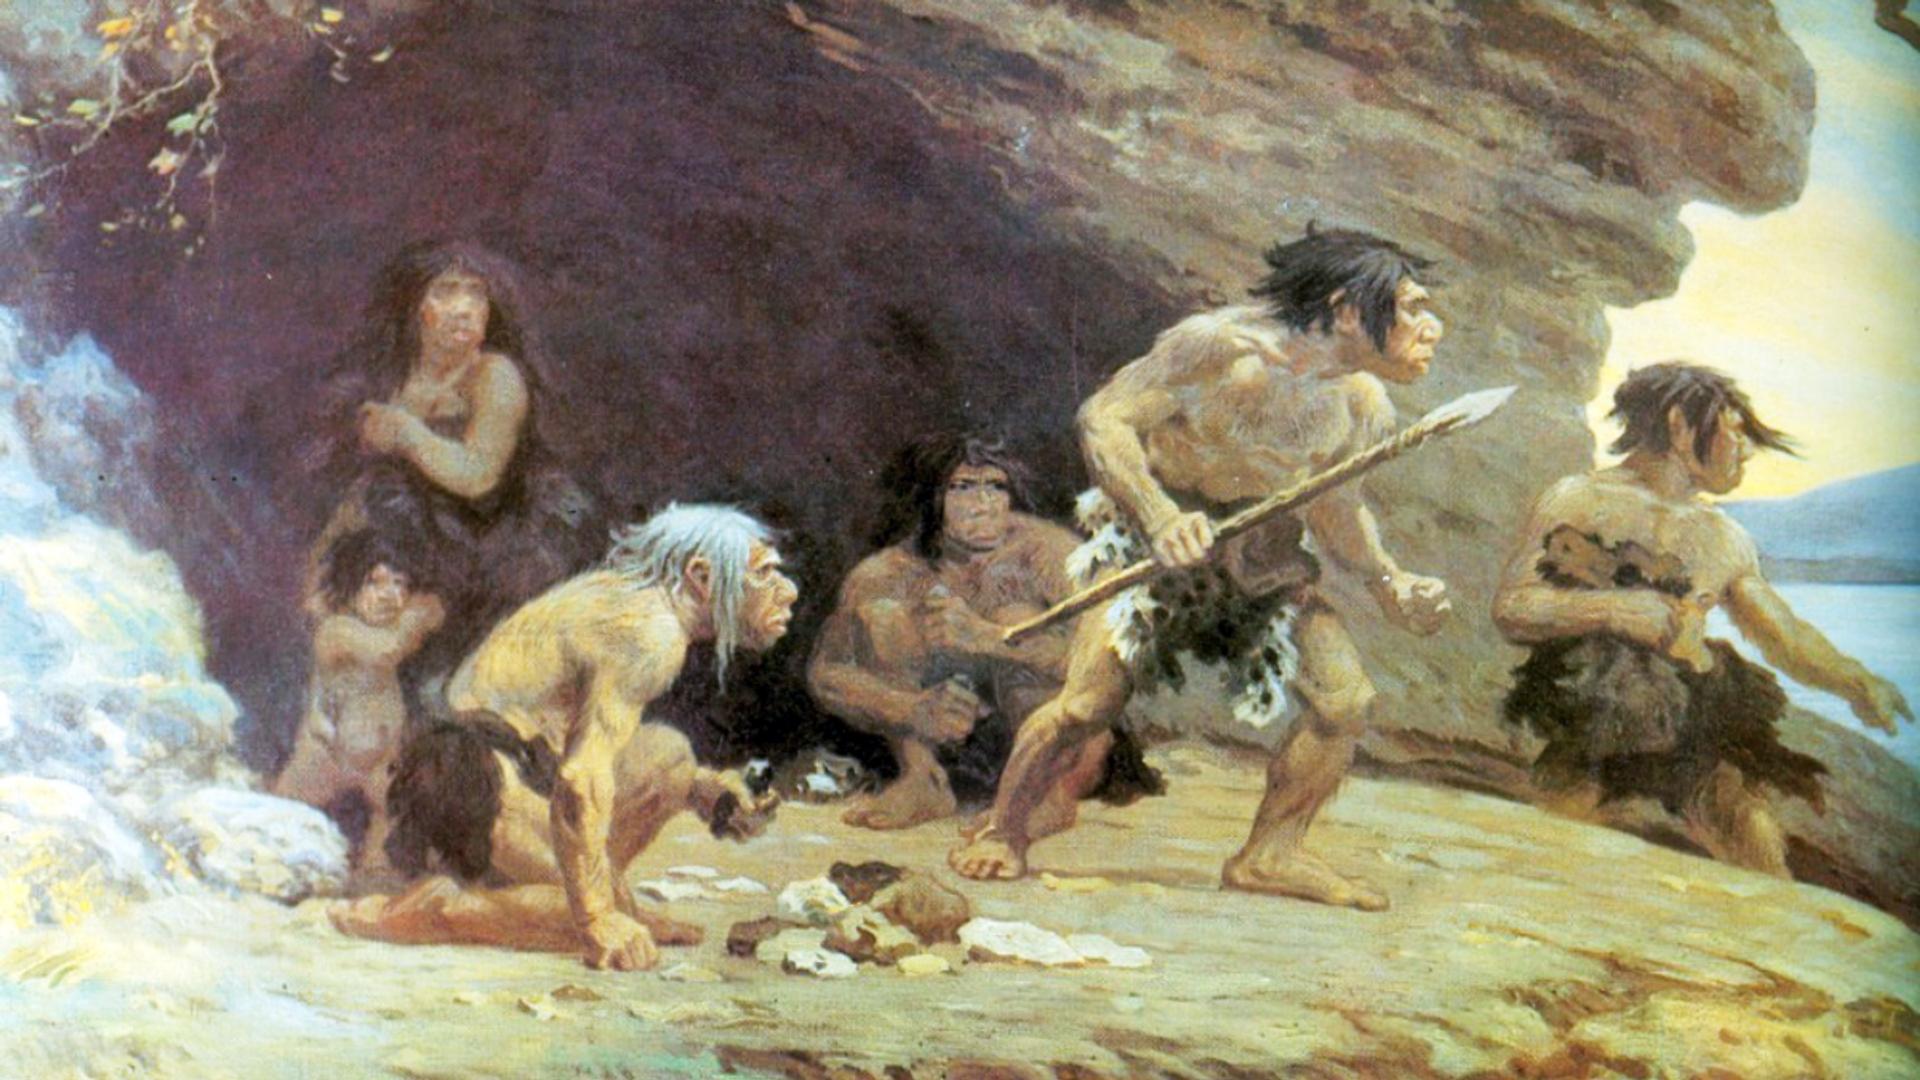 Los neandertales, imagen ilustrativa - Sputnik Mundo, 1920, 05.02.2021